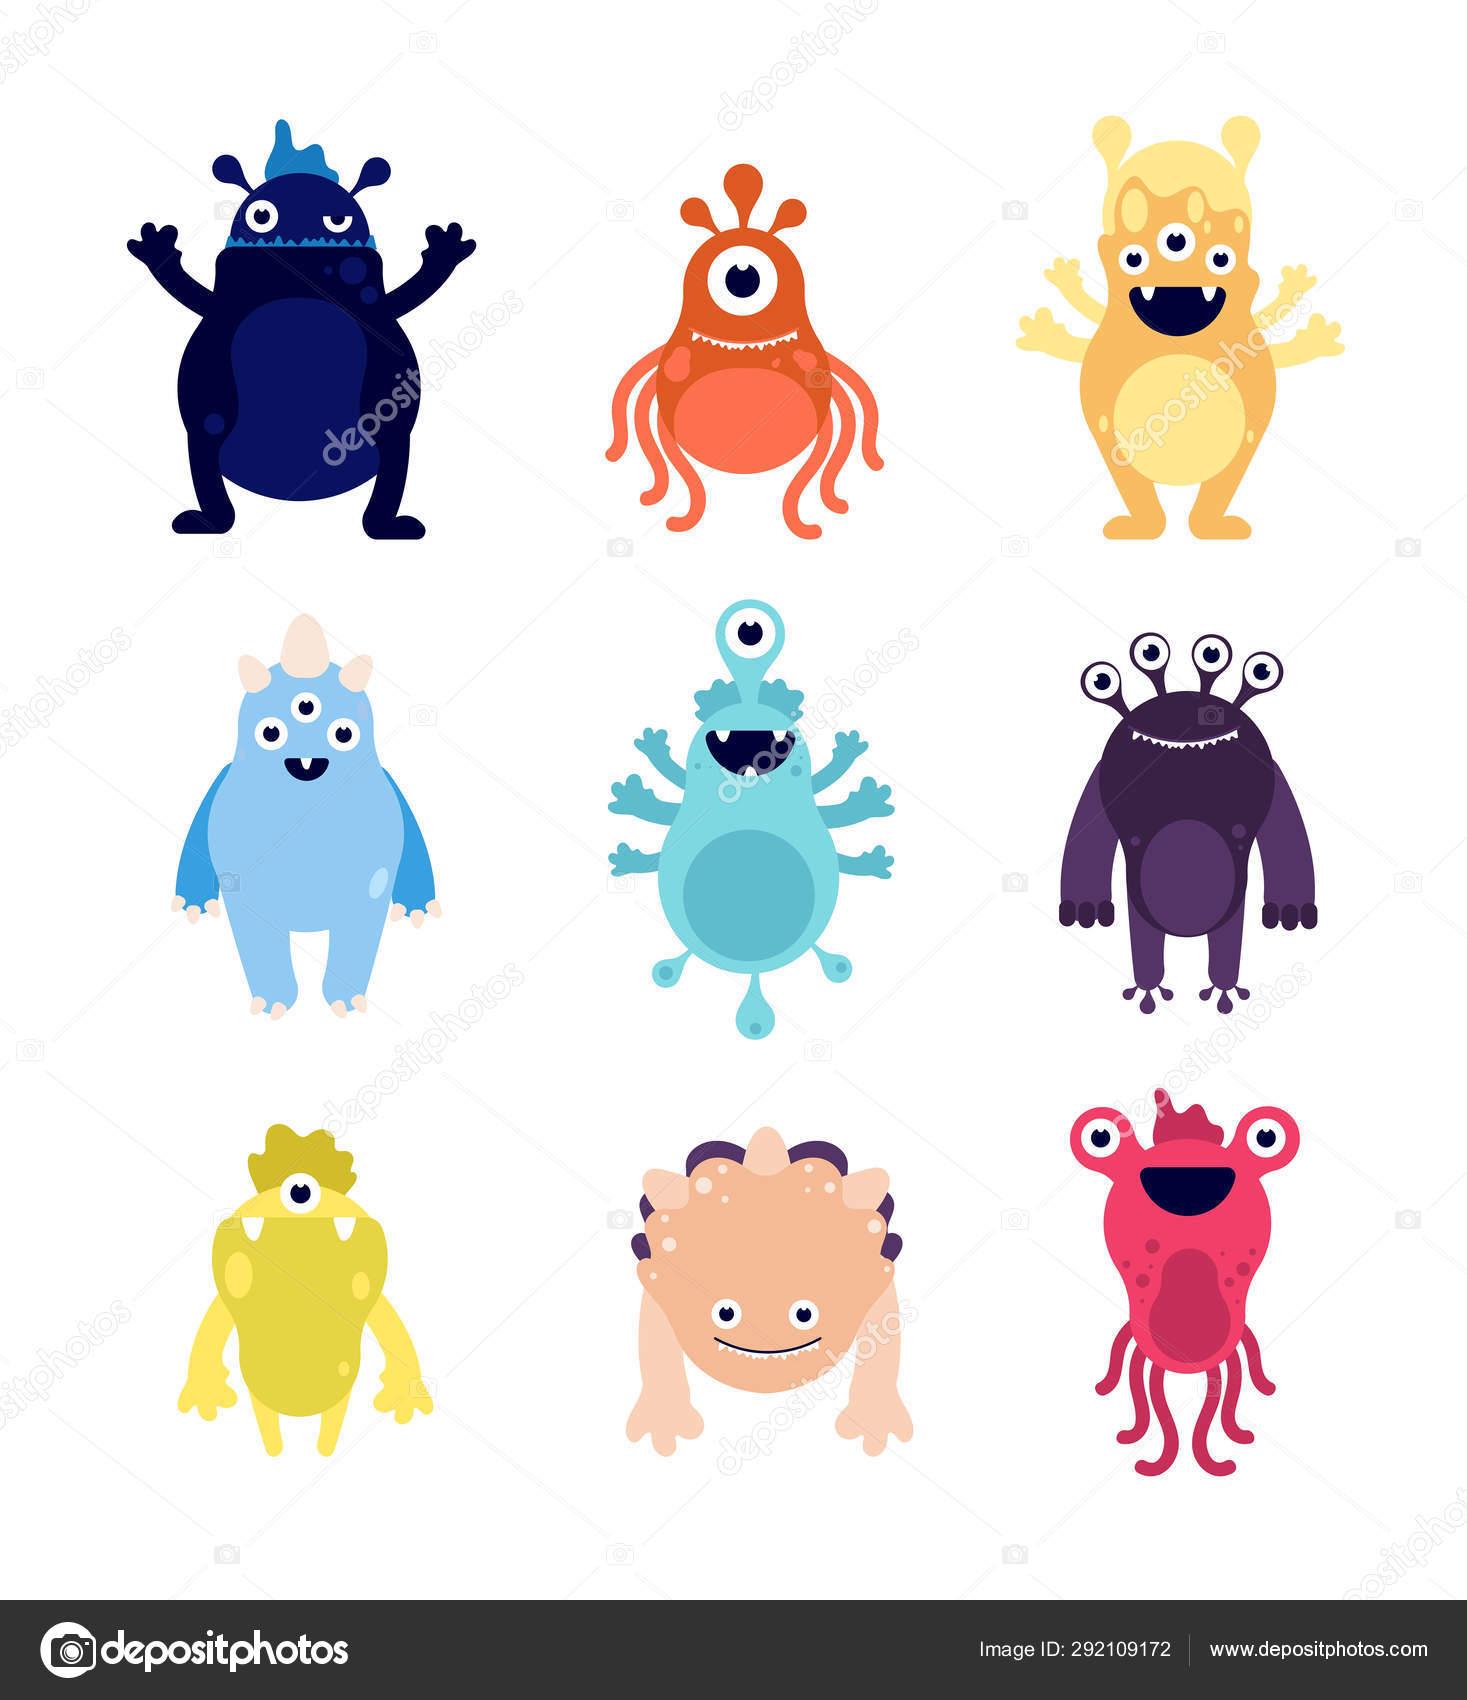 Funny monsters  Cute baby monster aliens bizarre avatars